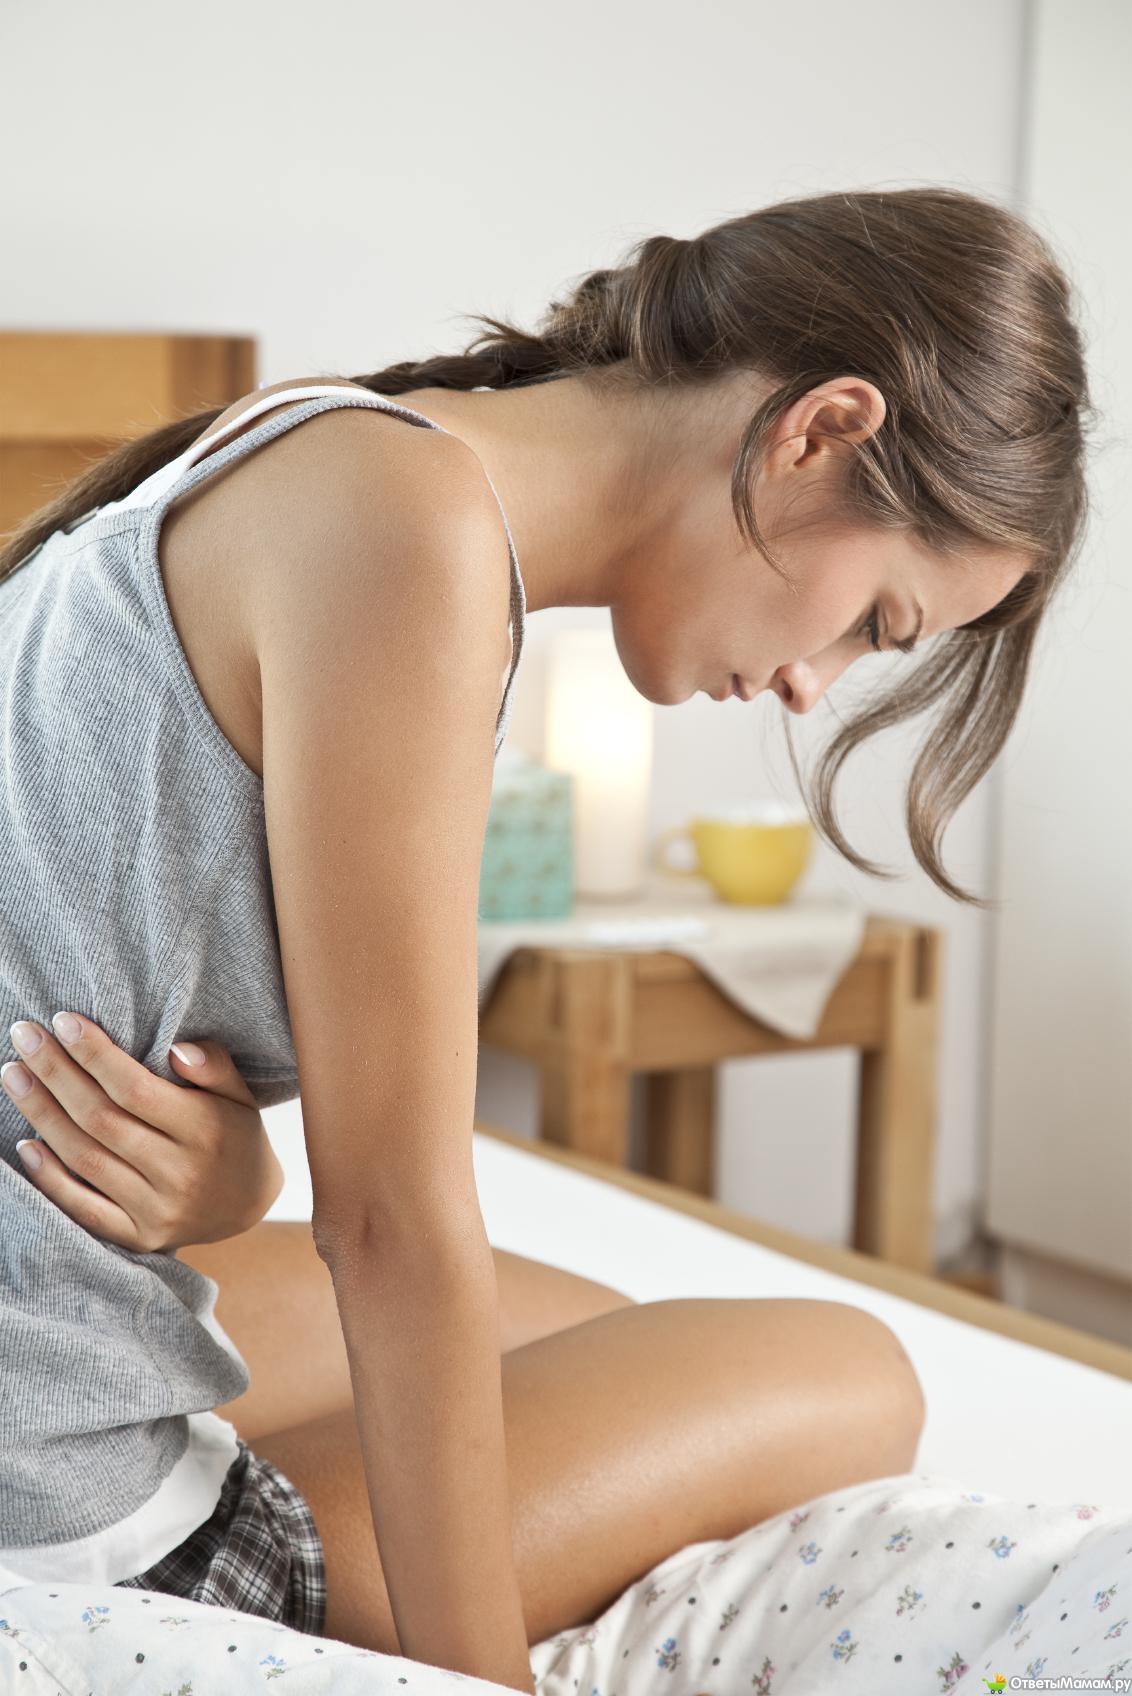 Безоперативное увеличение груди массаж